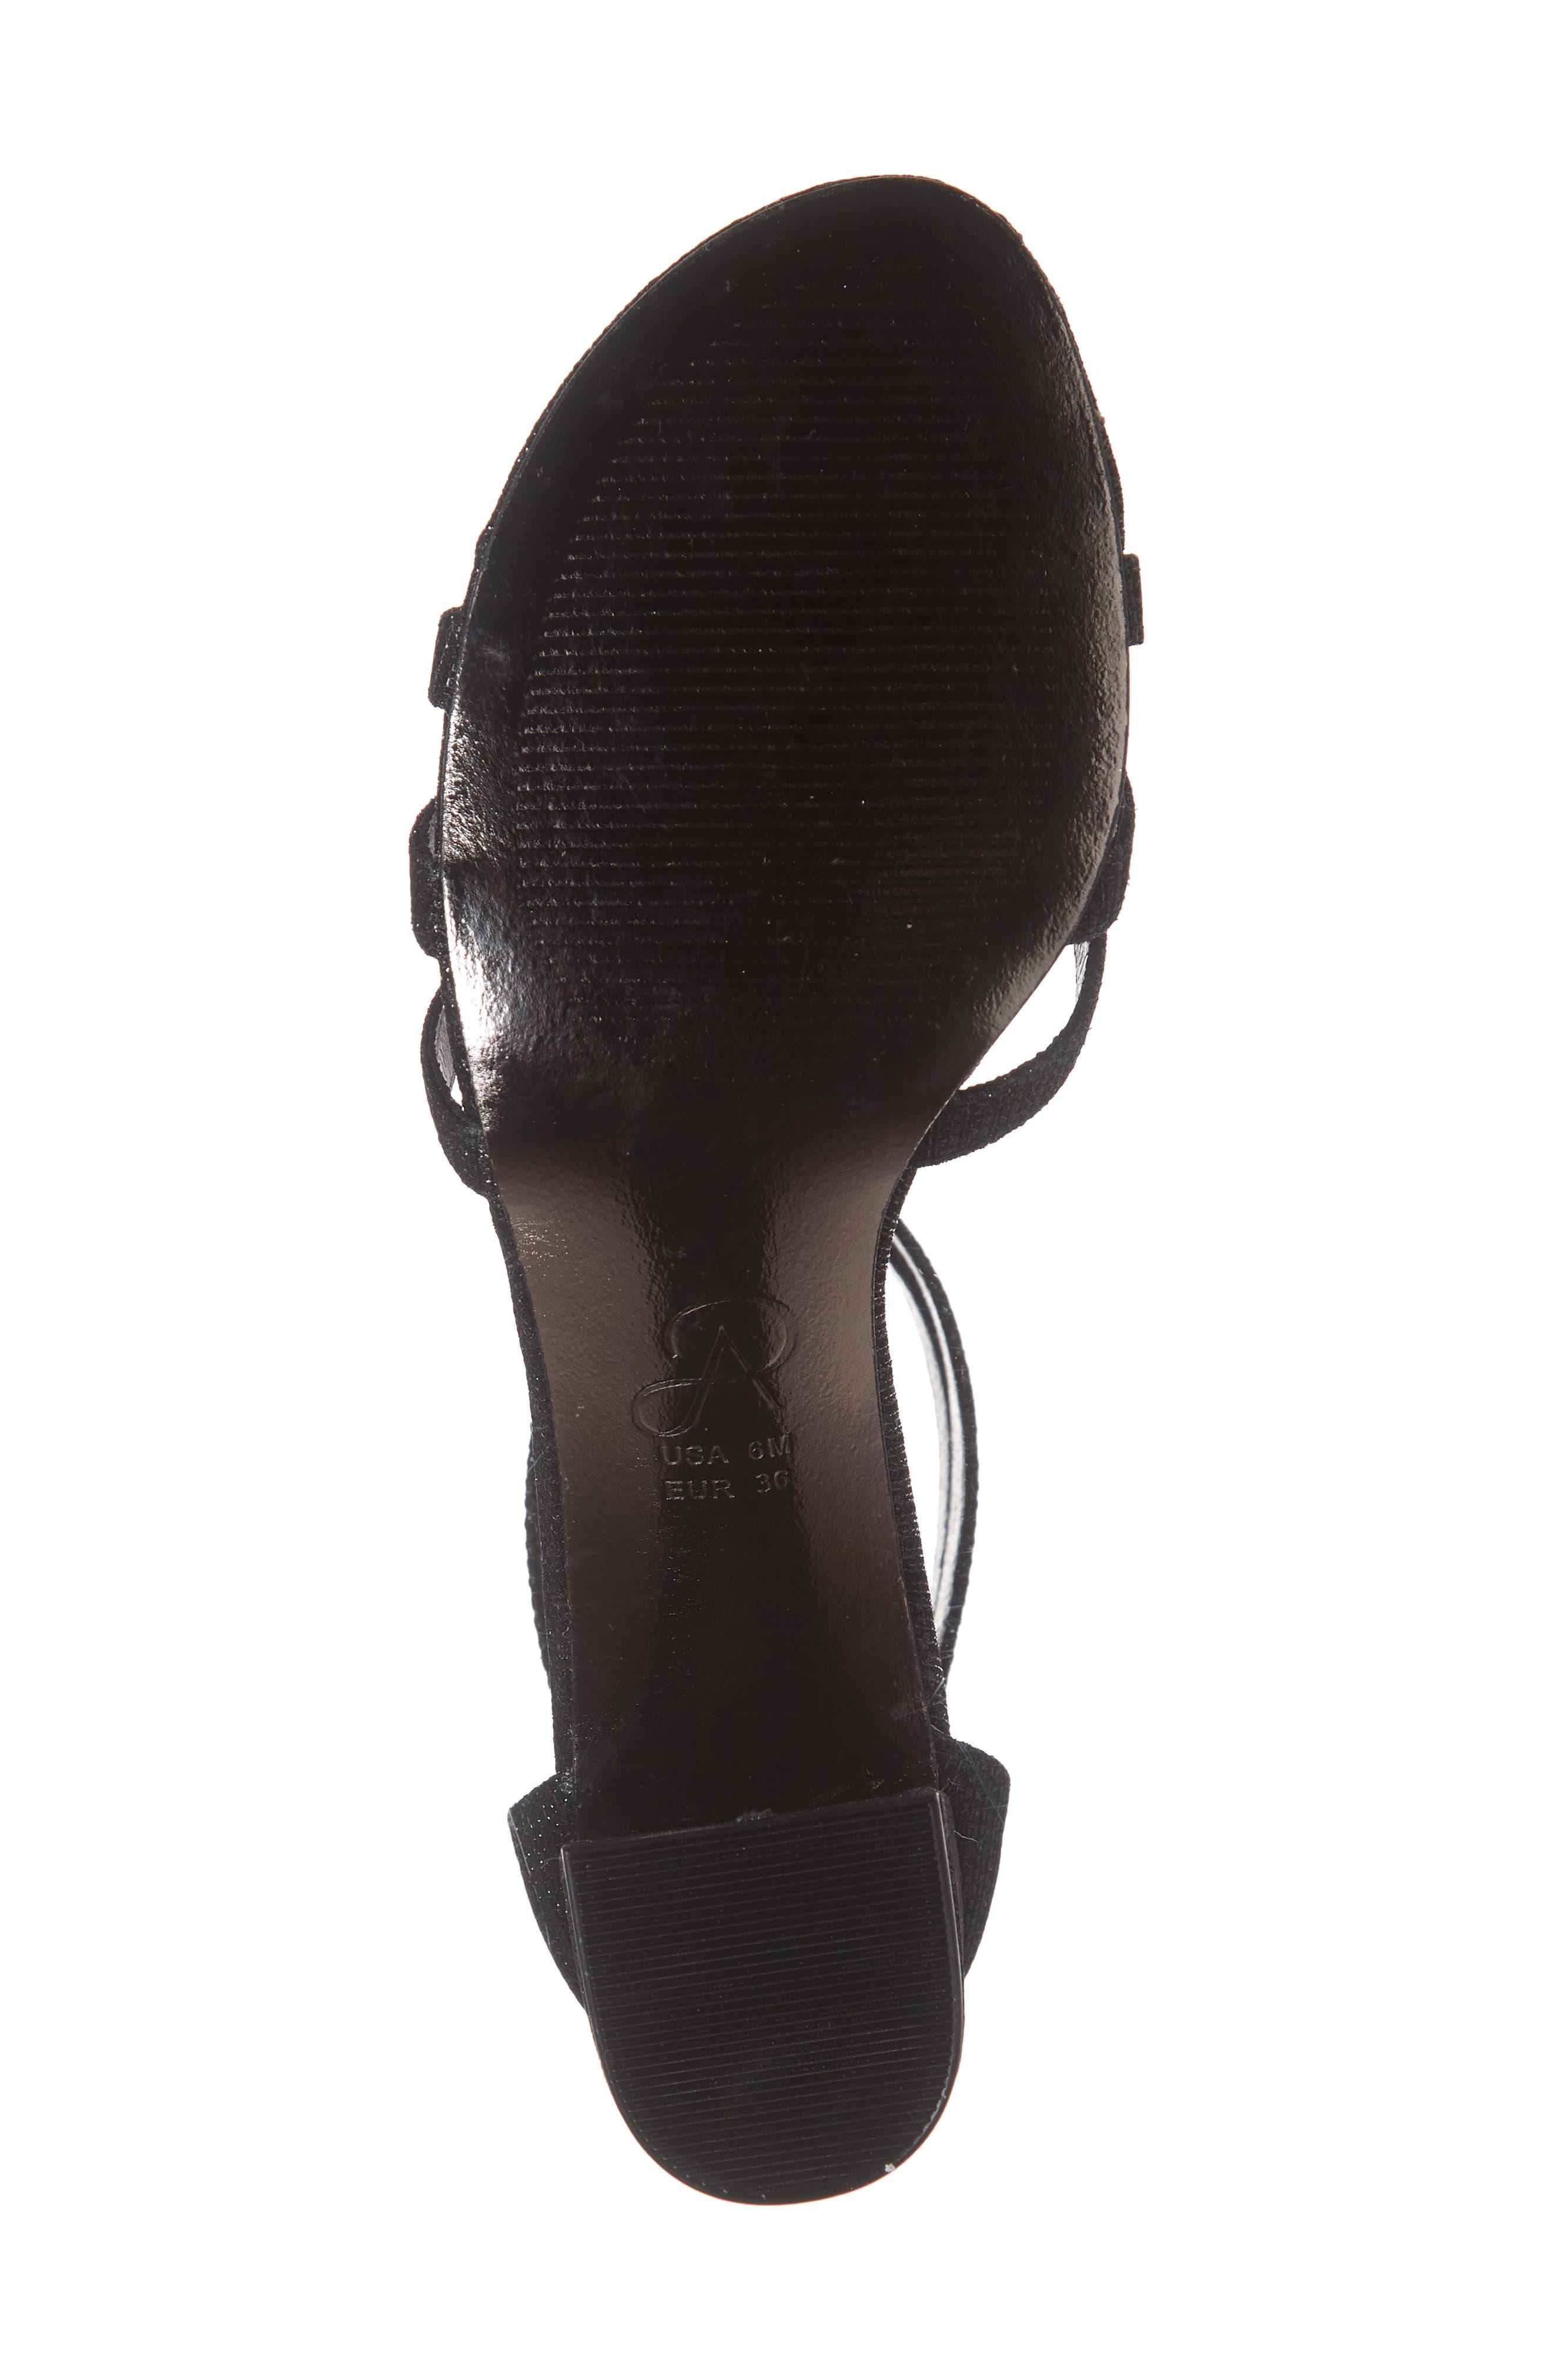 Anella Block Heel Sandal,                             Alternate thumbnail 6, color,                             BLACK GLITTER